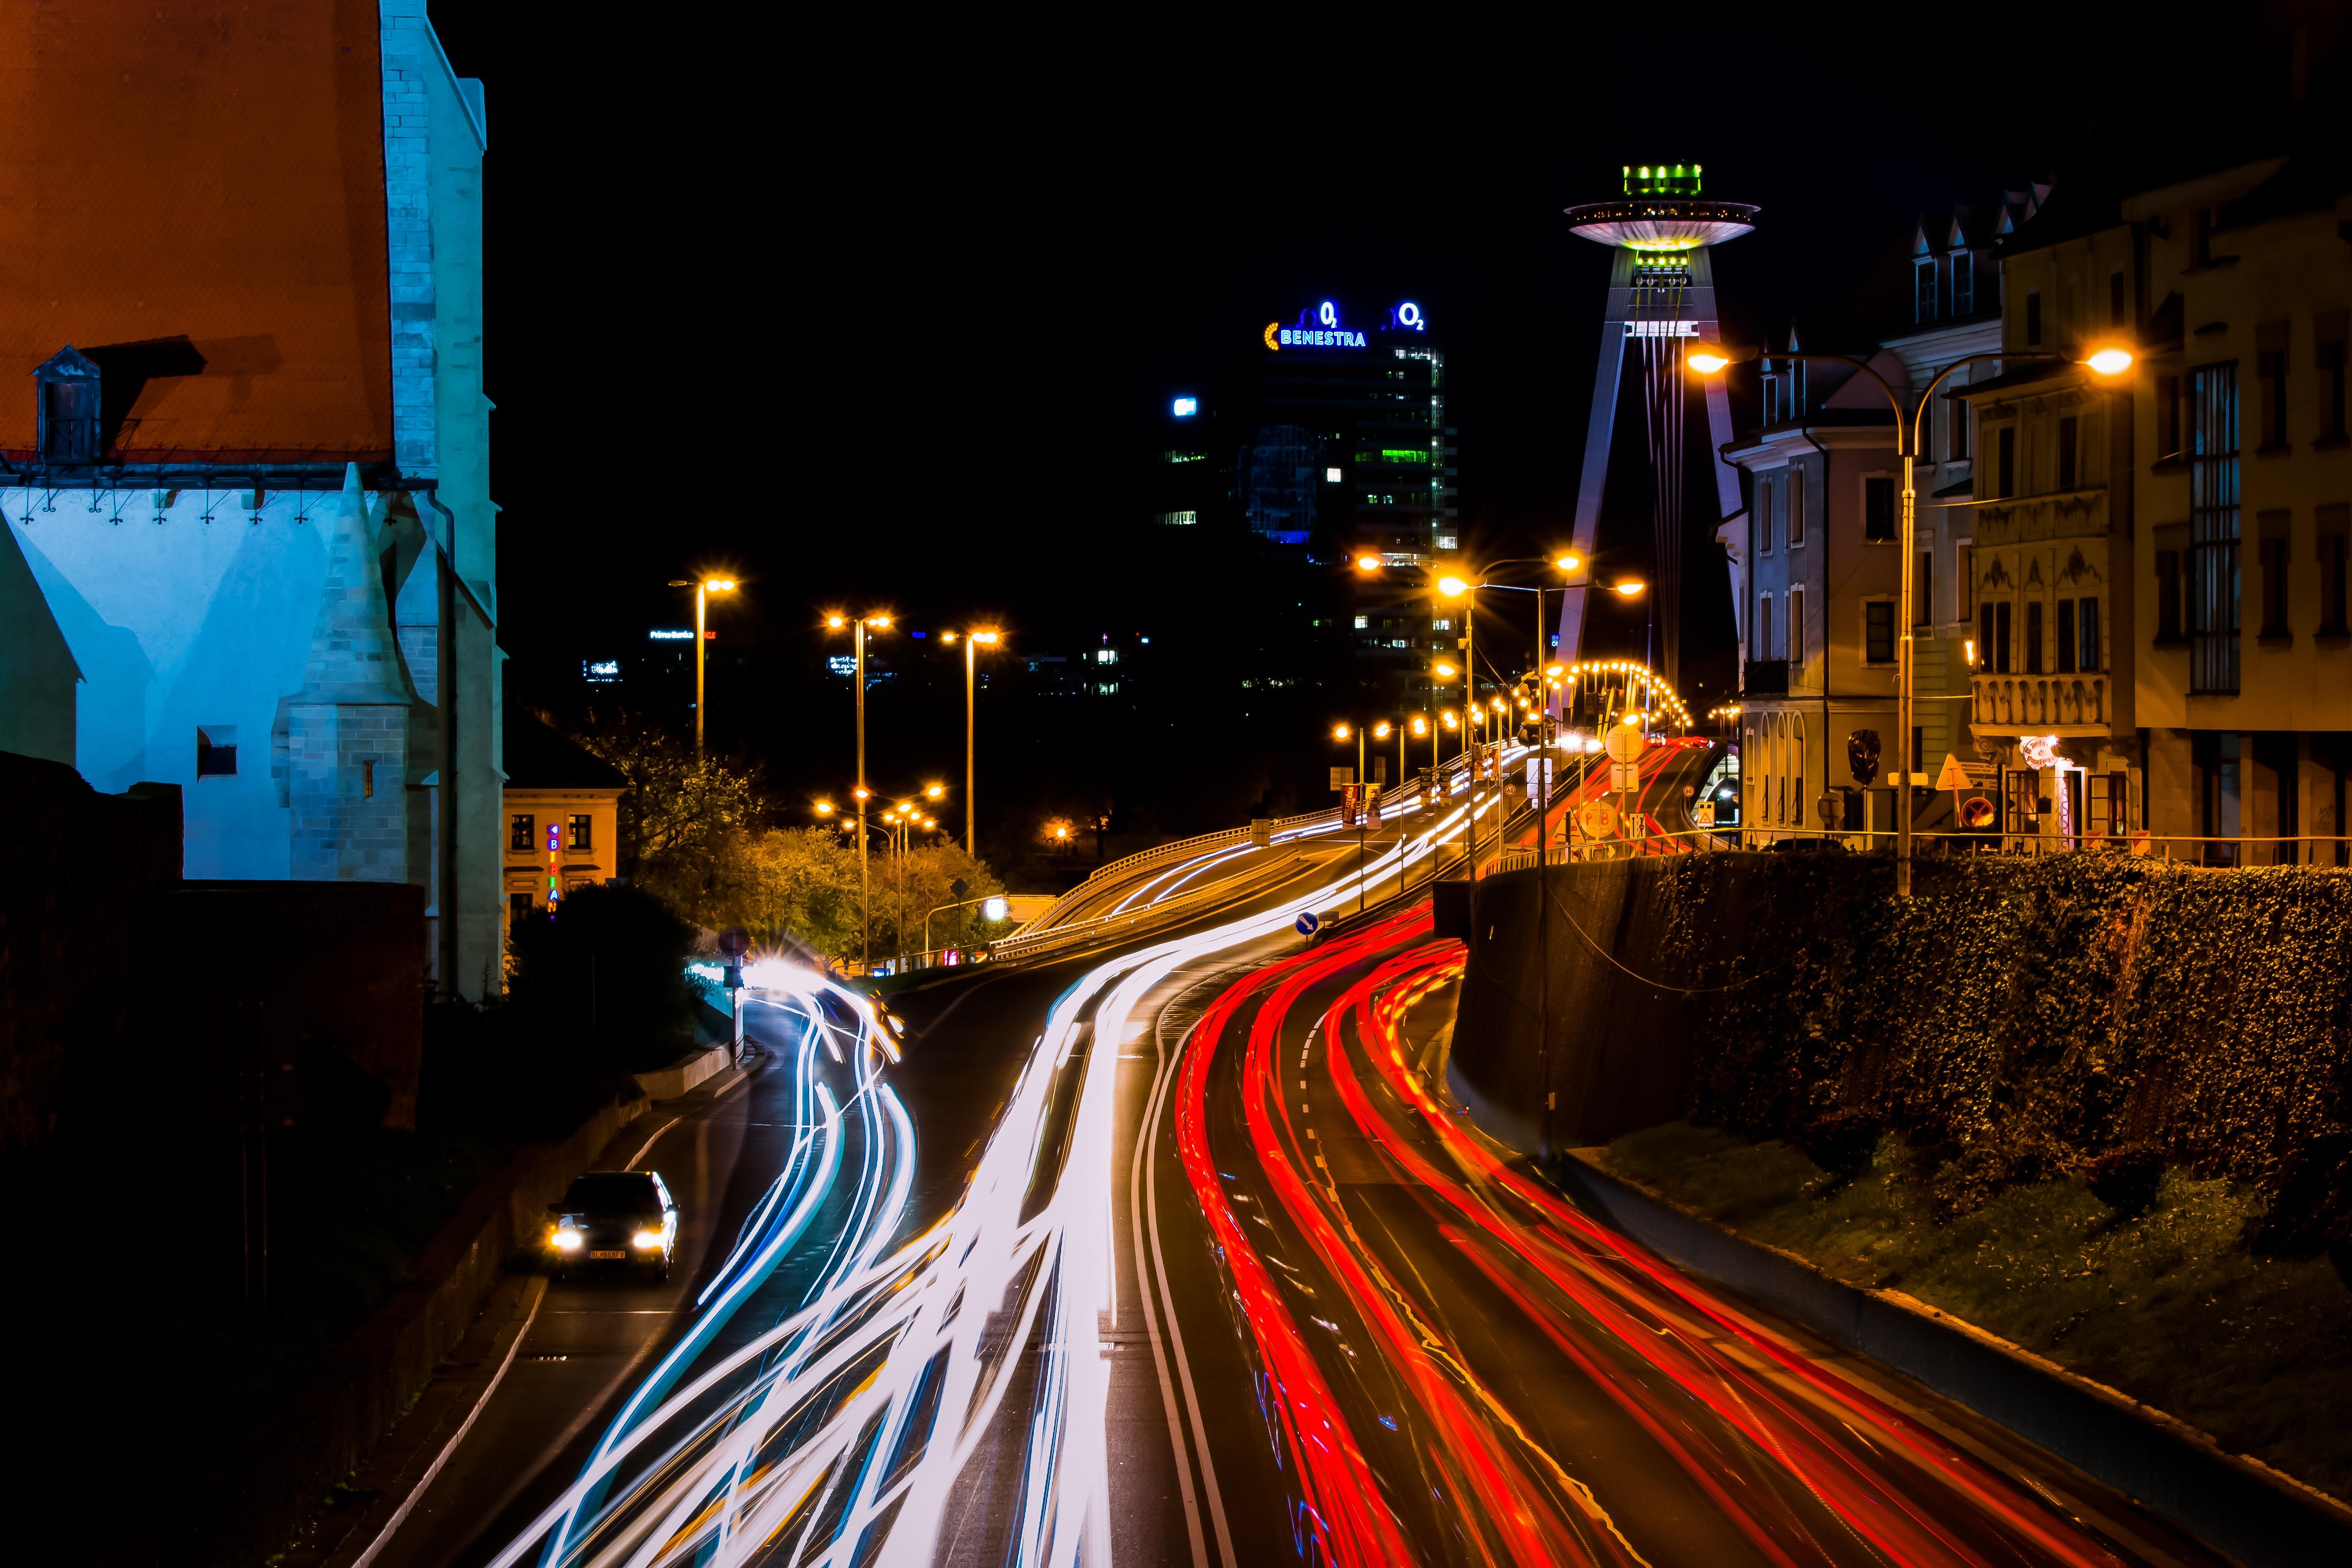 Timelapse Photo of City during Night, Blur, Light, Travel, Transportation system, HQ Photo